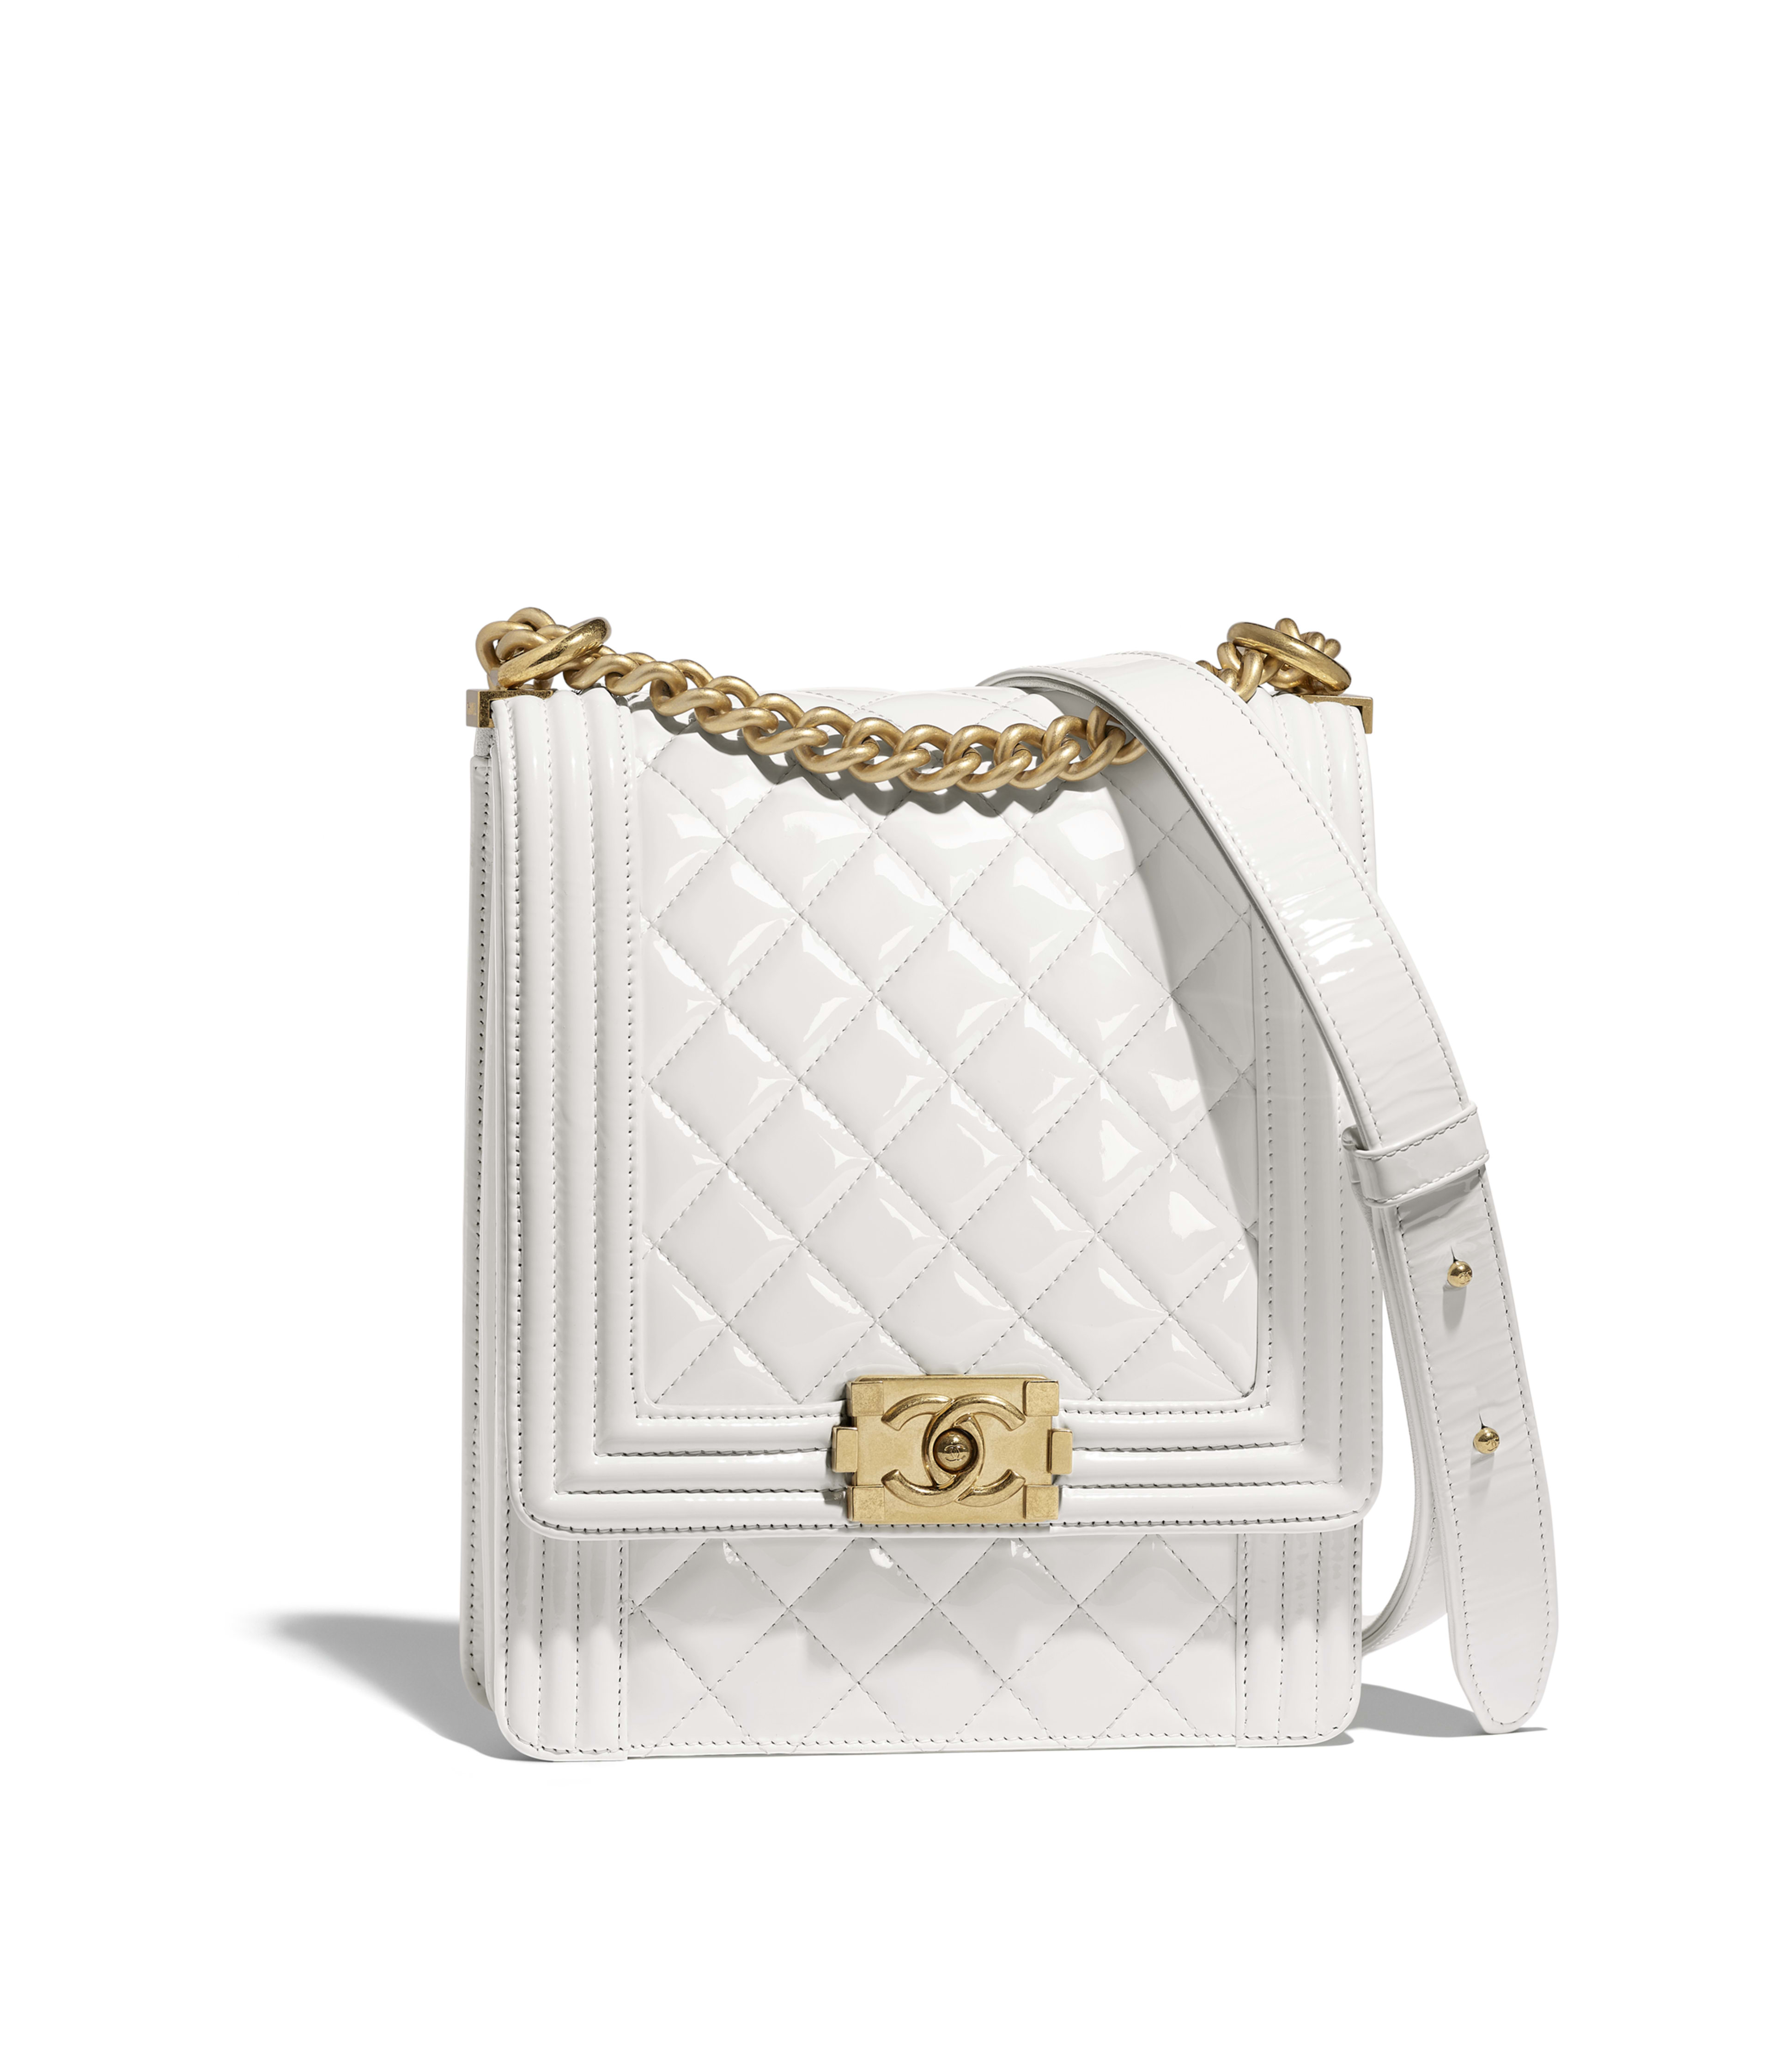 Flap Bags Handbags Chanel